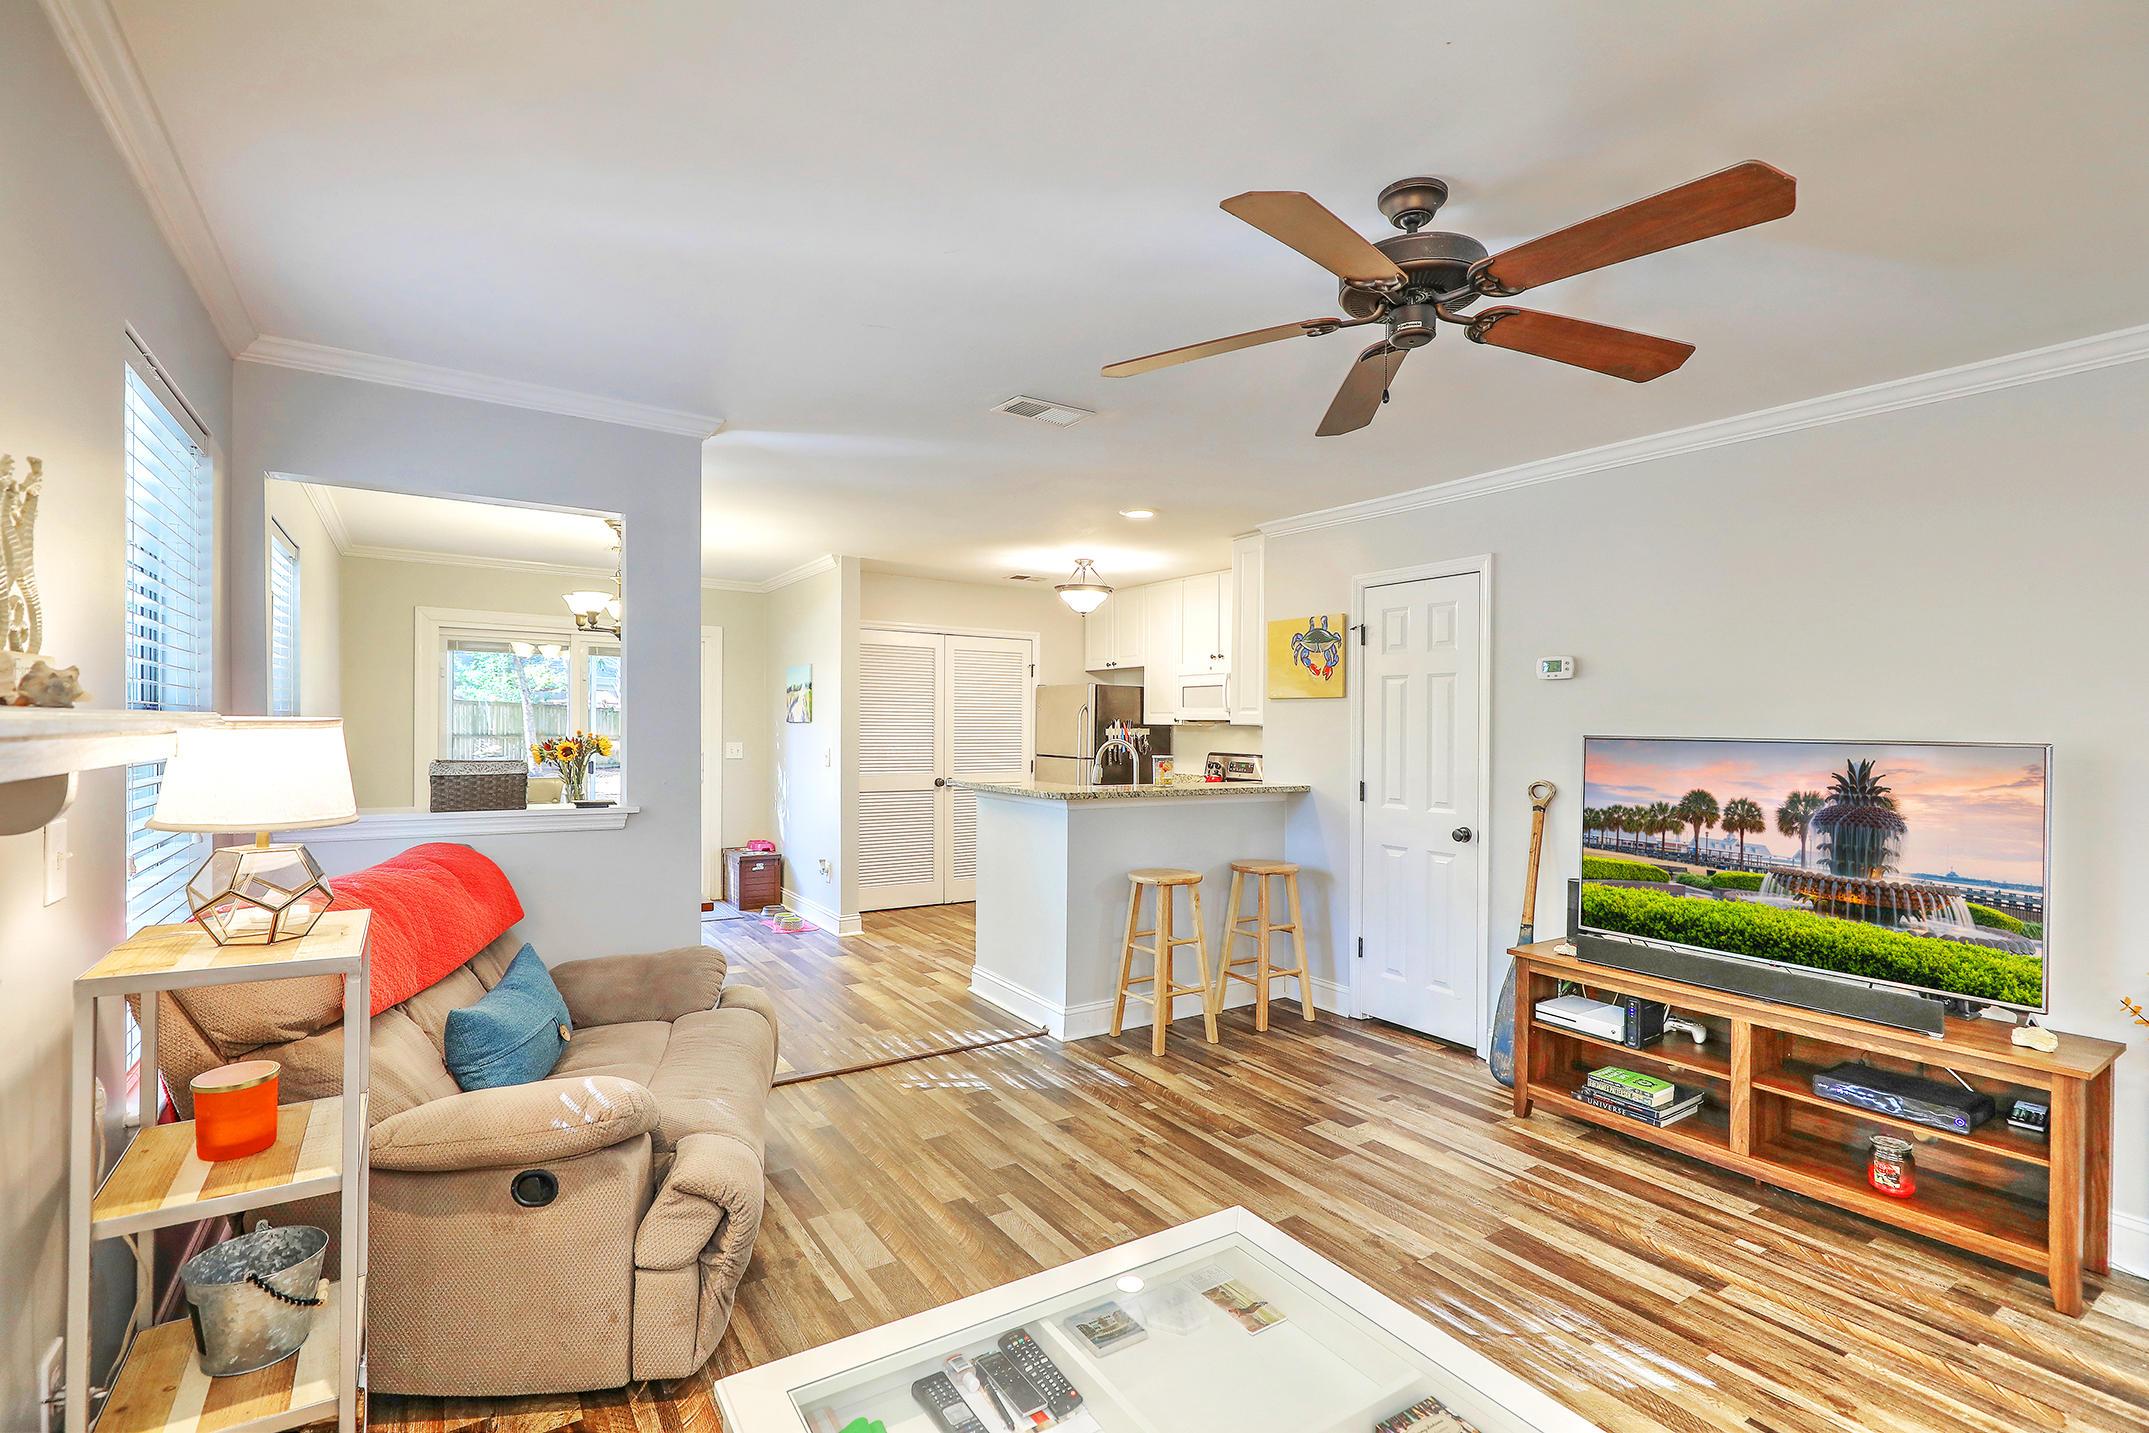 Remington Forest Homes For Sale - 1366 Cassidy, Mount Pleasant, SC - 6